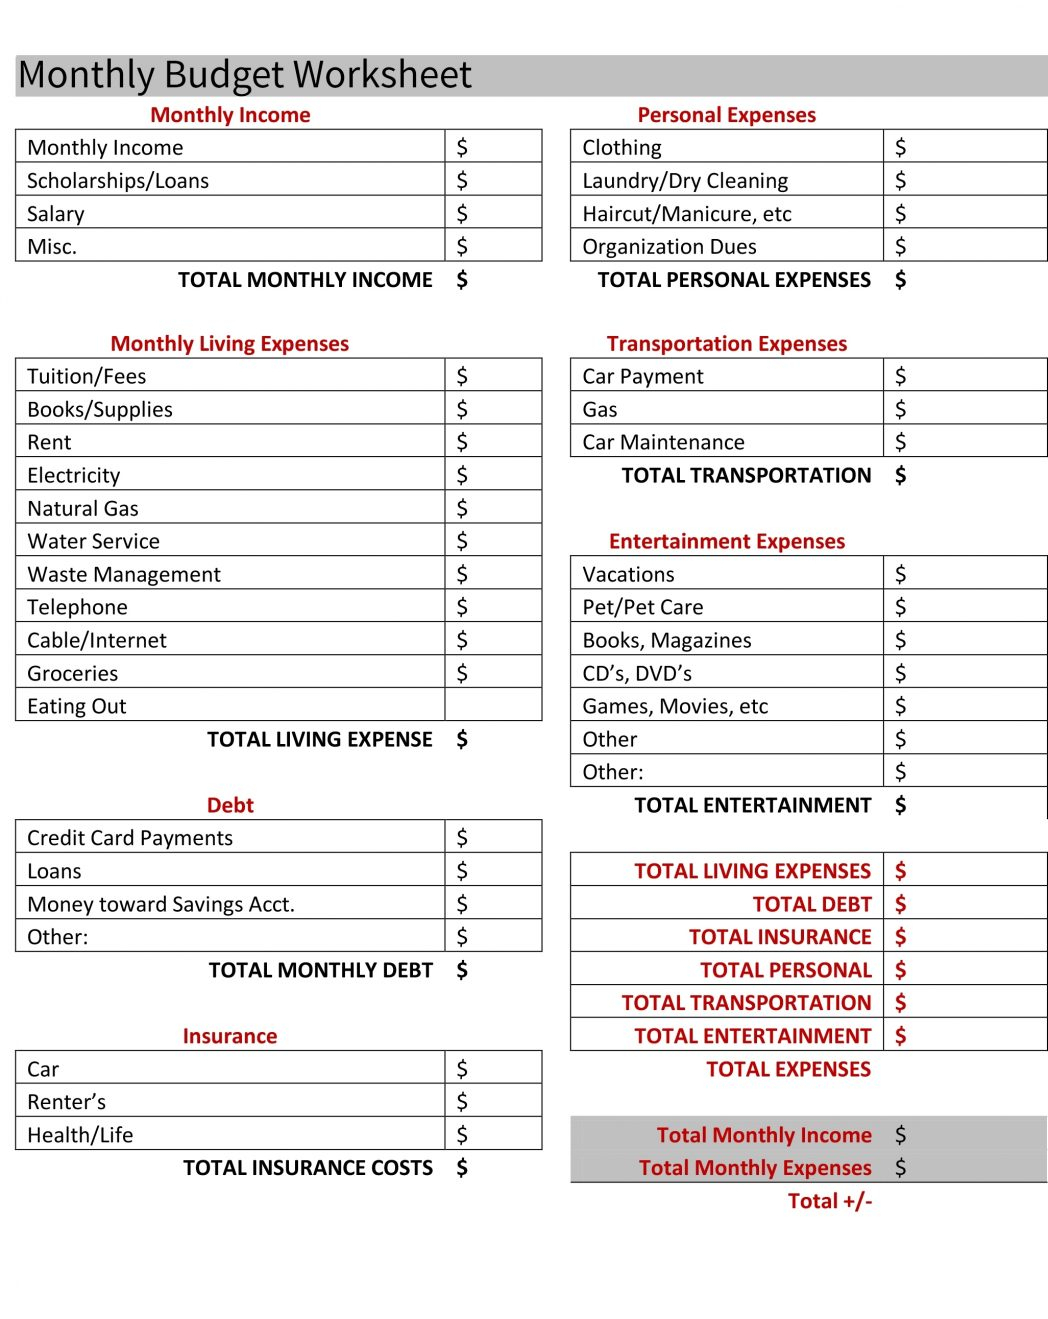 Best Free Budget Spreadsheet Throughout Free Budget Spreadsheet The Best Worksheets Image Collect ~ Epaperzone